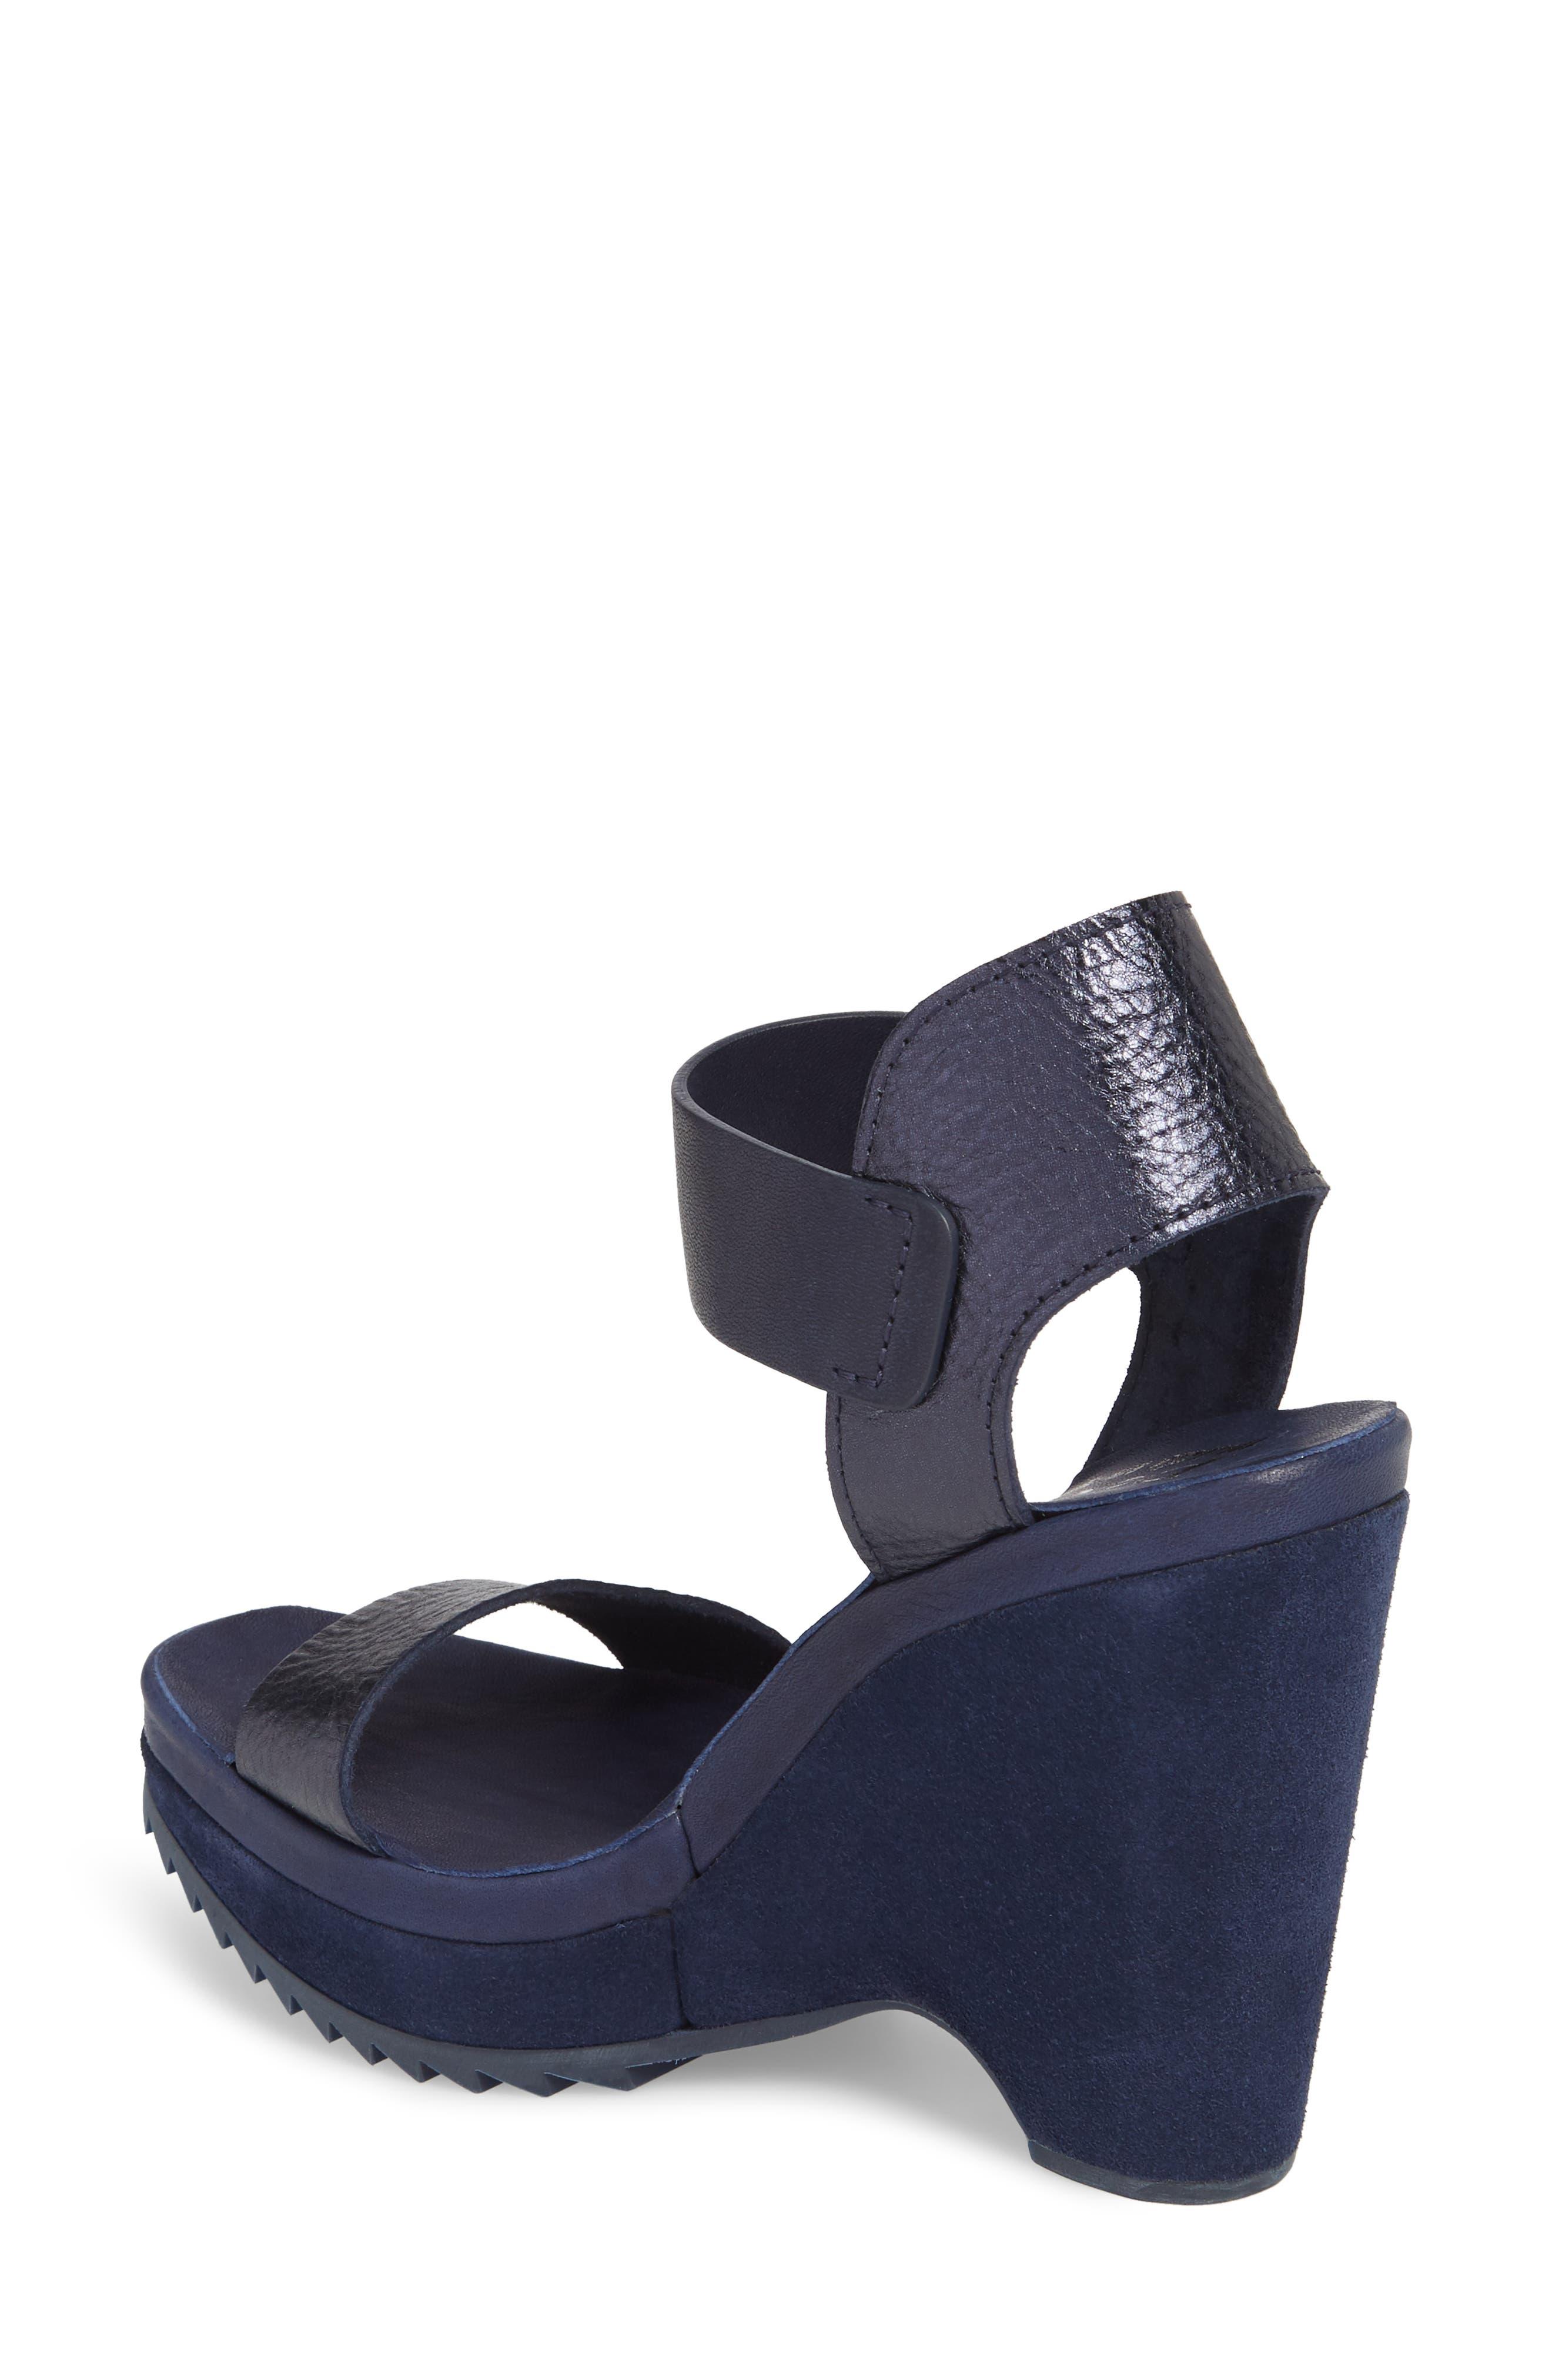 Vida Platform Wedge Sandal,                             Alternate thumbnail 2, color,                             MARINA